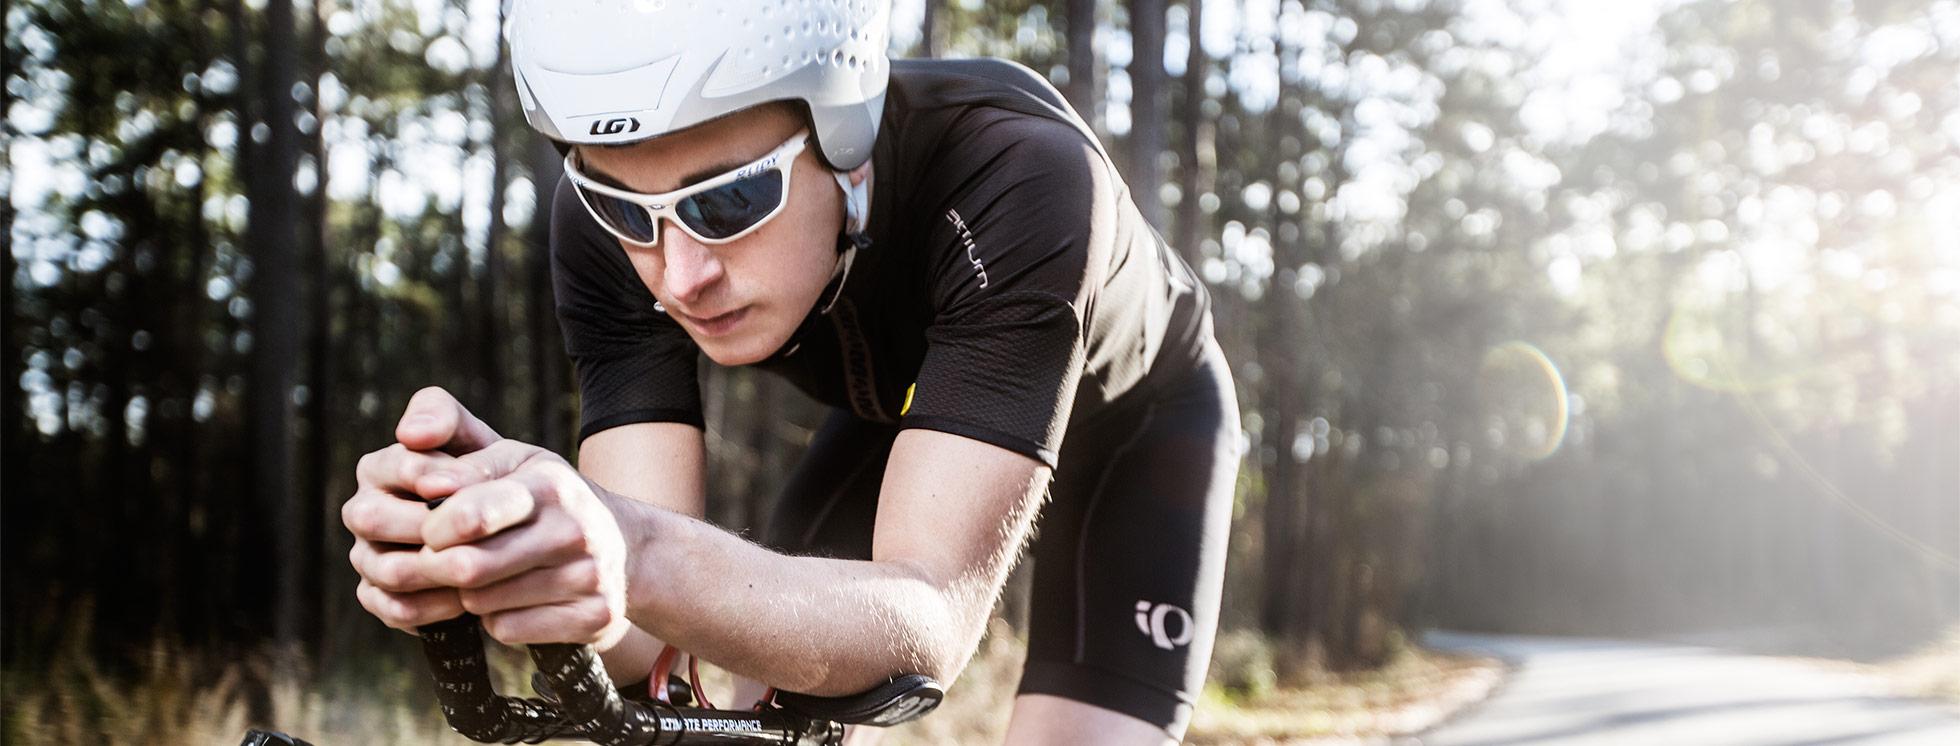 Behind the Scenes: Cody Beals – Pro Triathlete